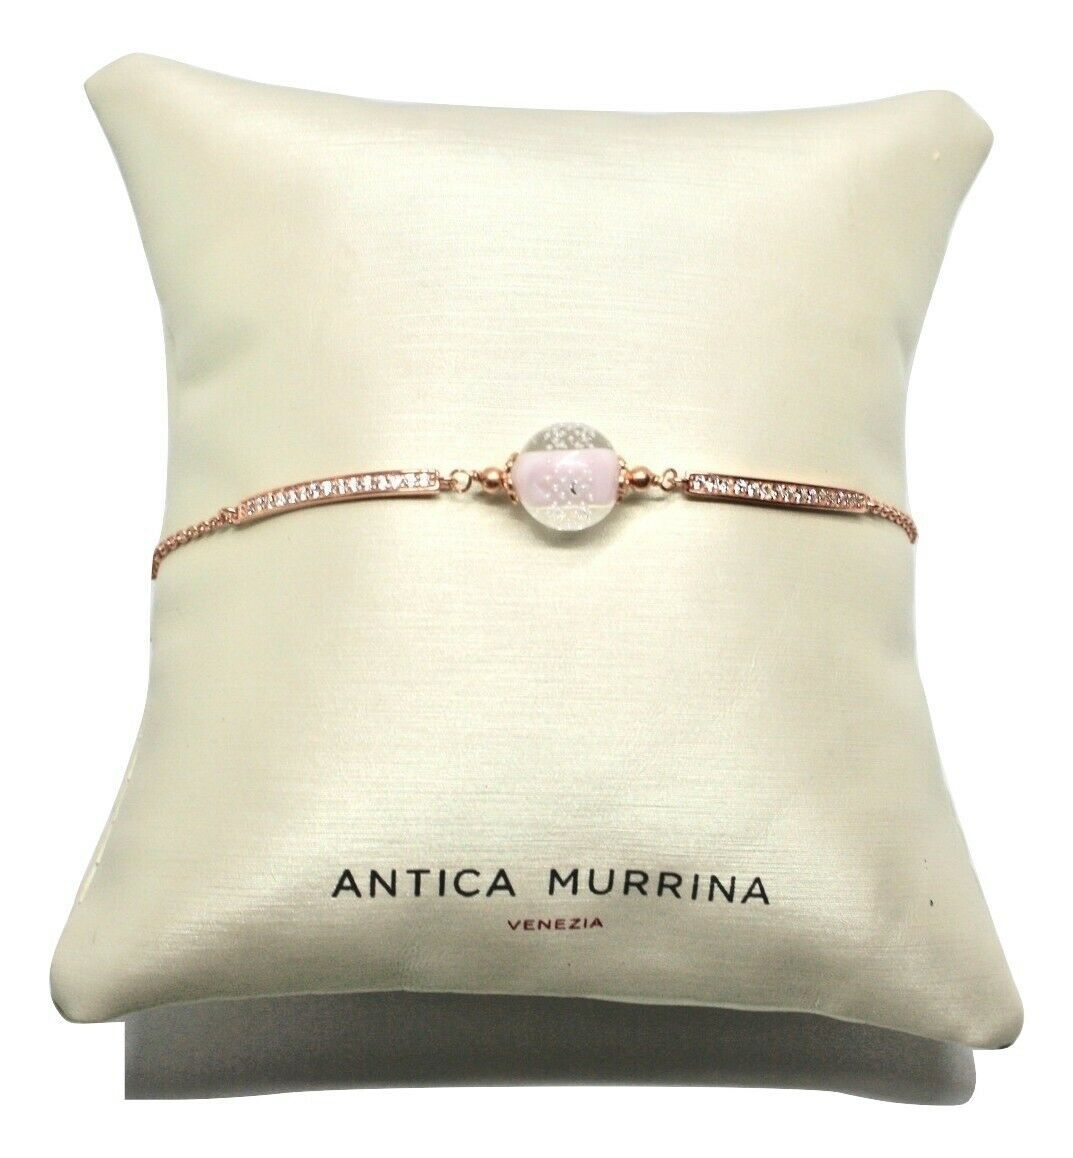 Armband Antica Murrina Venezia 925 Silber und Glas Murano AMVJWBT009C03